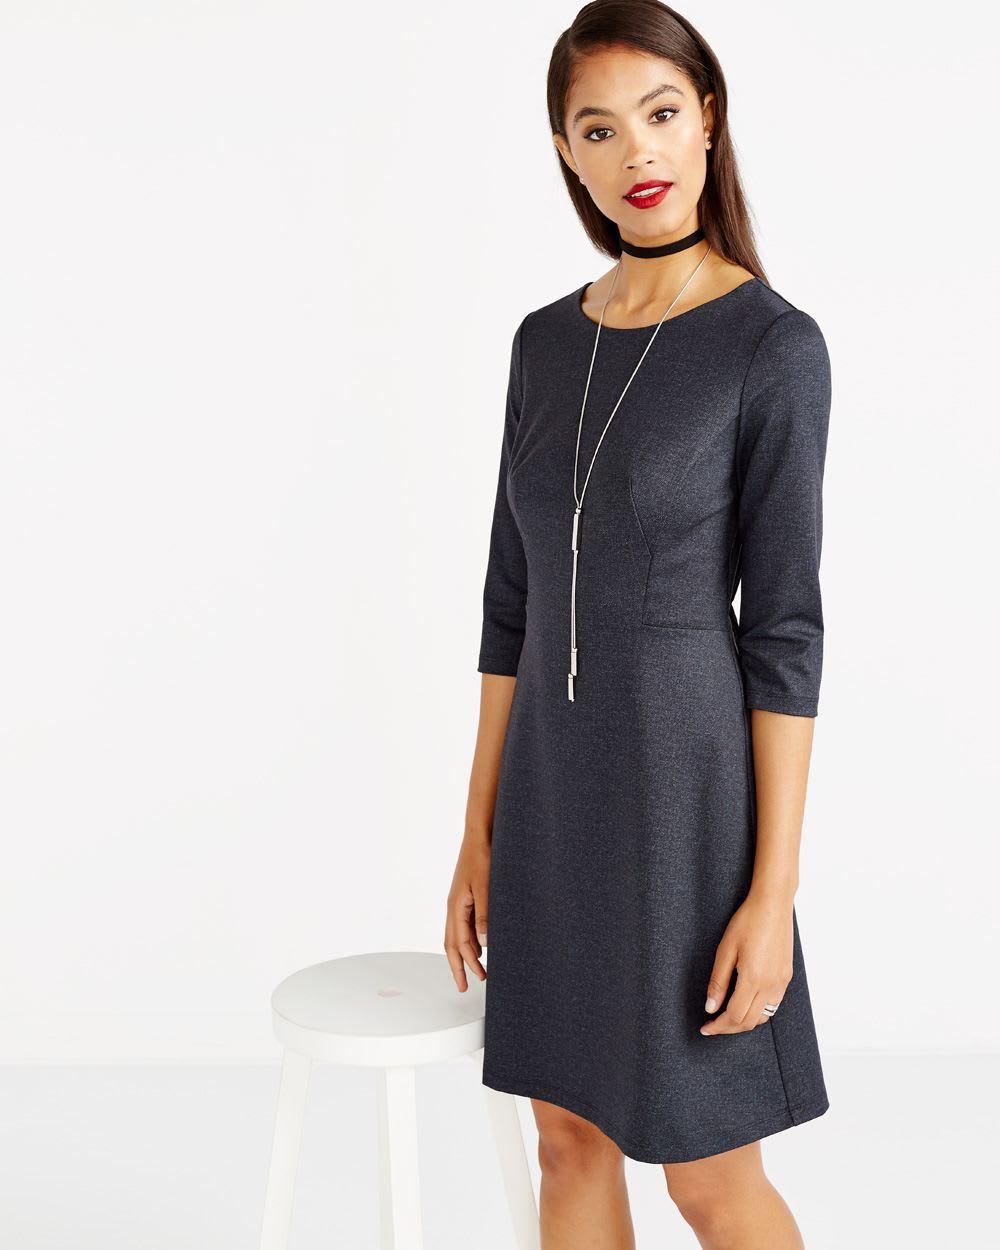 ¾ Sleeve Solid Dress